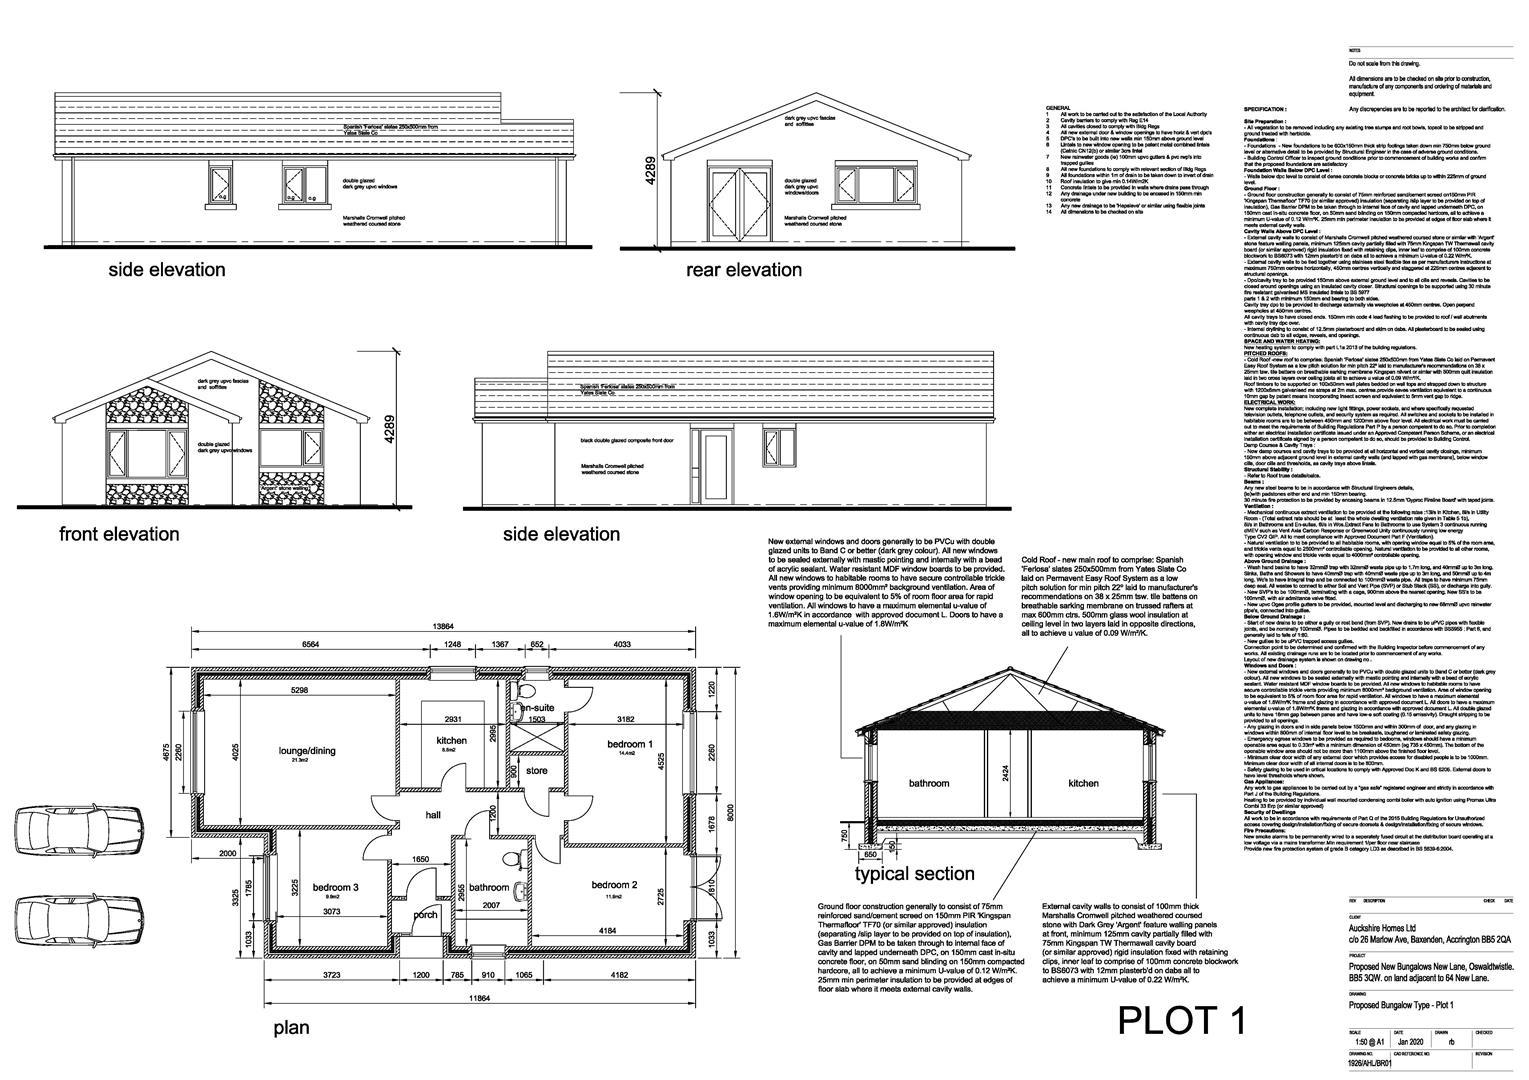 3 Bedroom Detached Bungalow For Sale - 1926-ahl-br01 plot 1-page-001.jpg